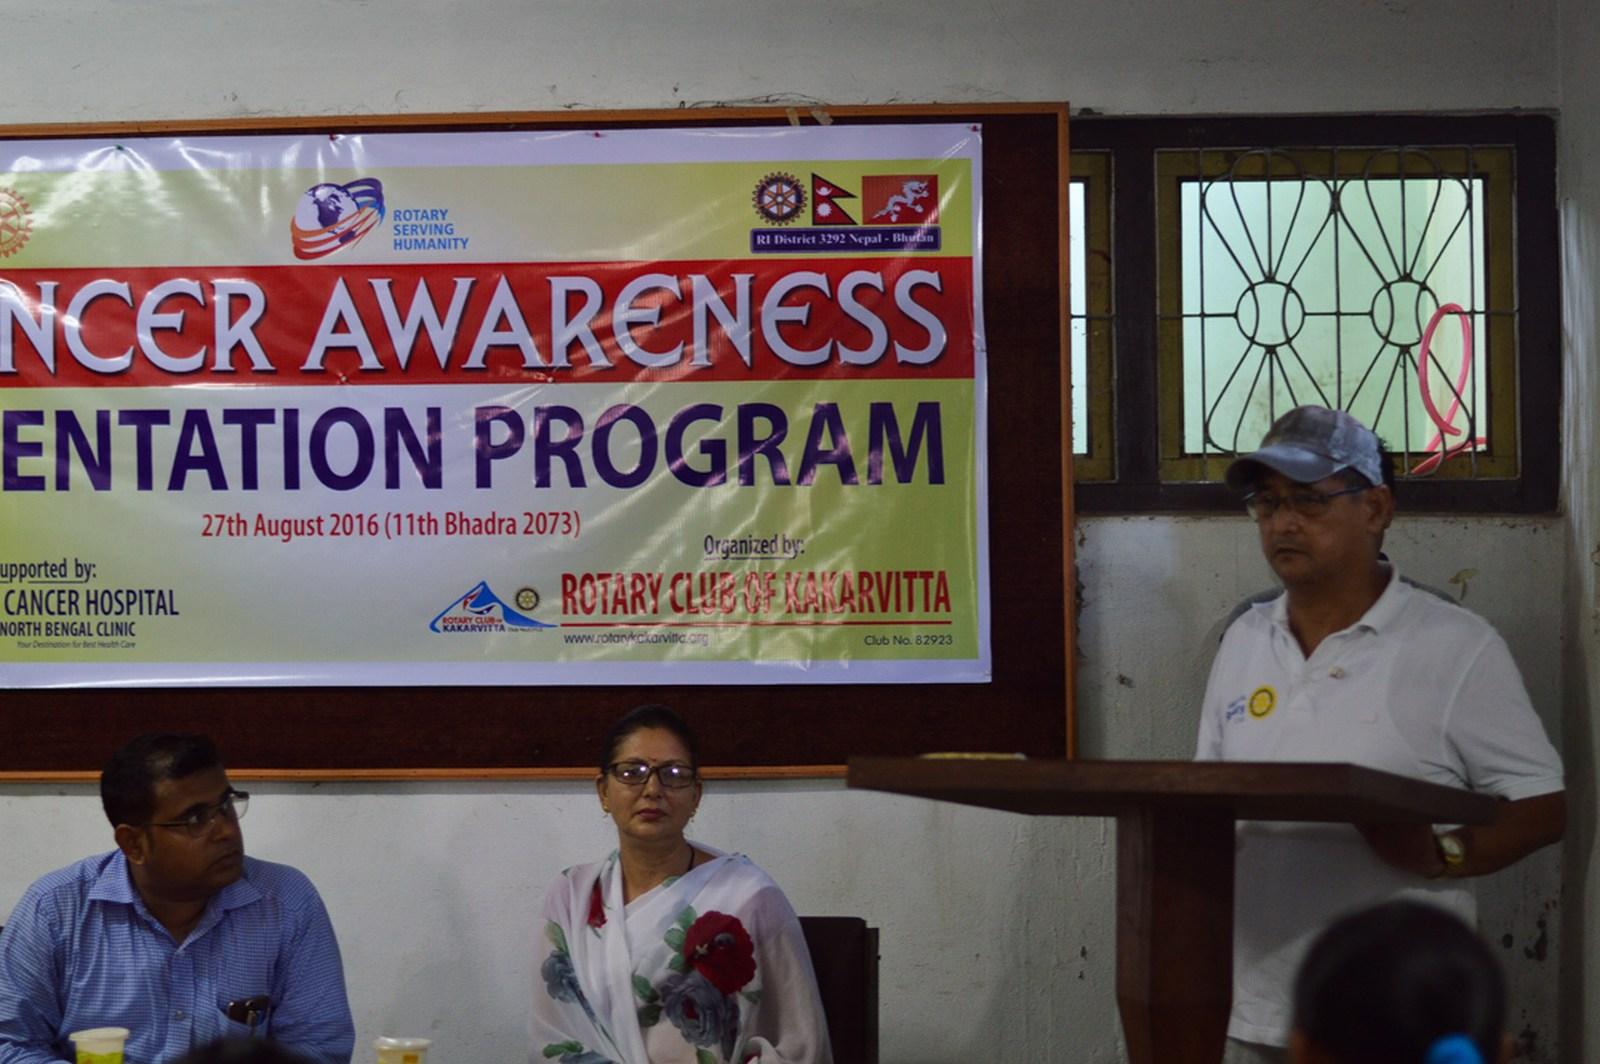 Cancer-Awareness-Orientation-Program-2016-Rotary-Club-of-Kakarvitta-30